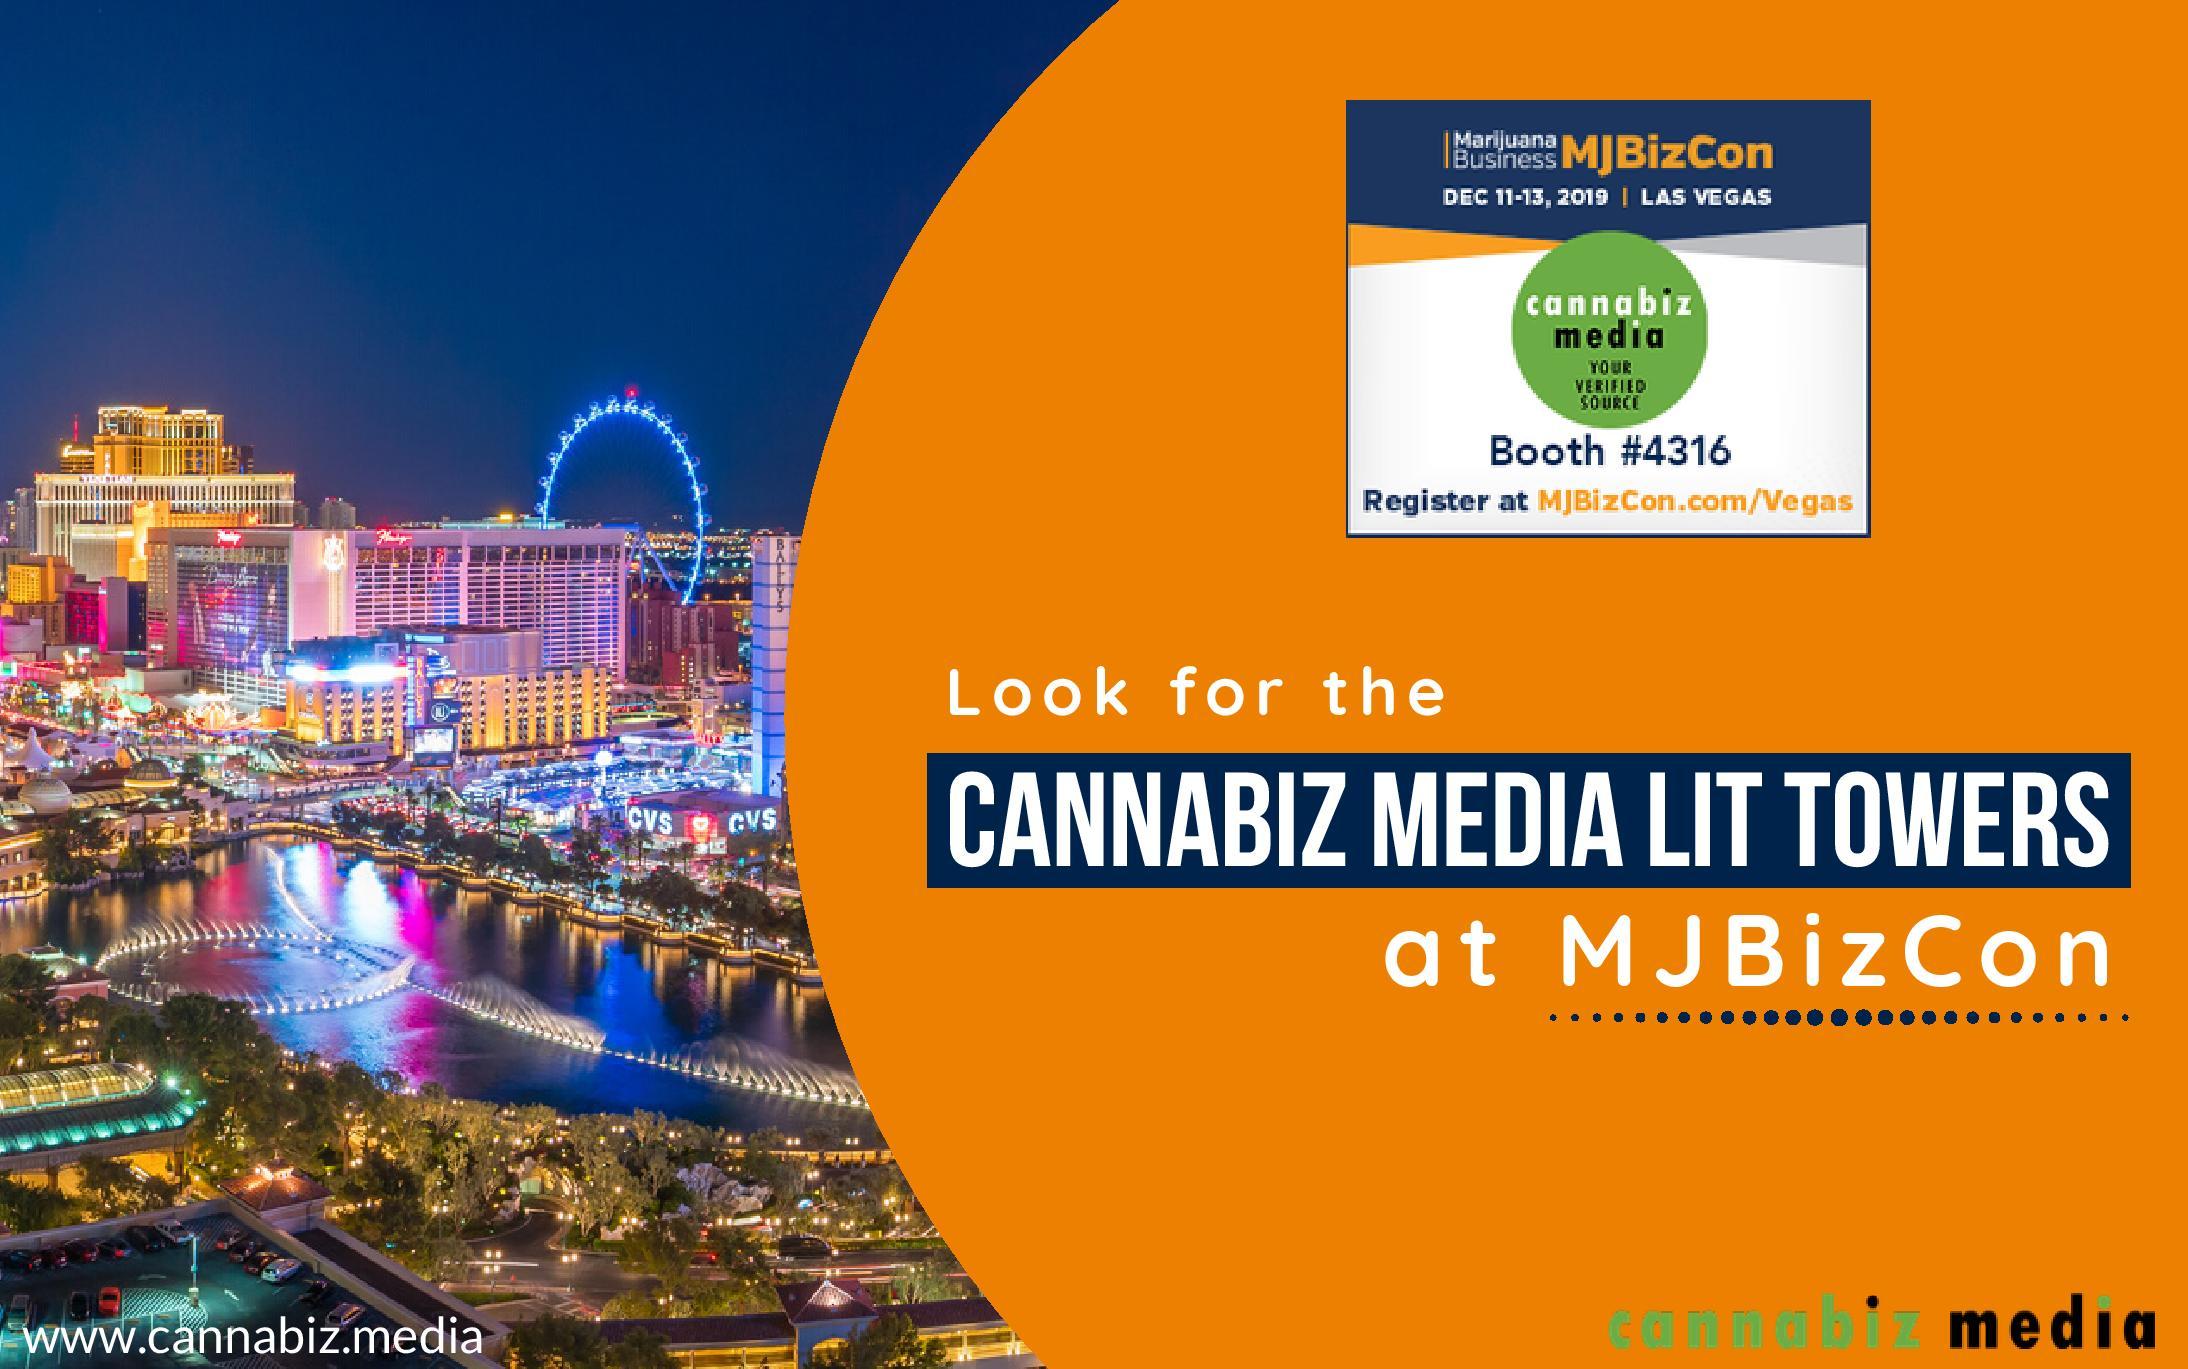 Look for the Cannabiz Media Lit Towers at MJBizCon